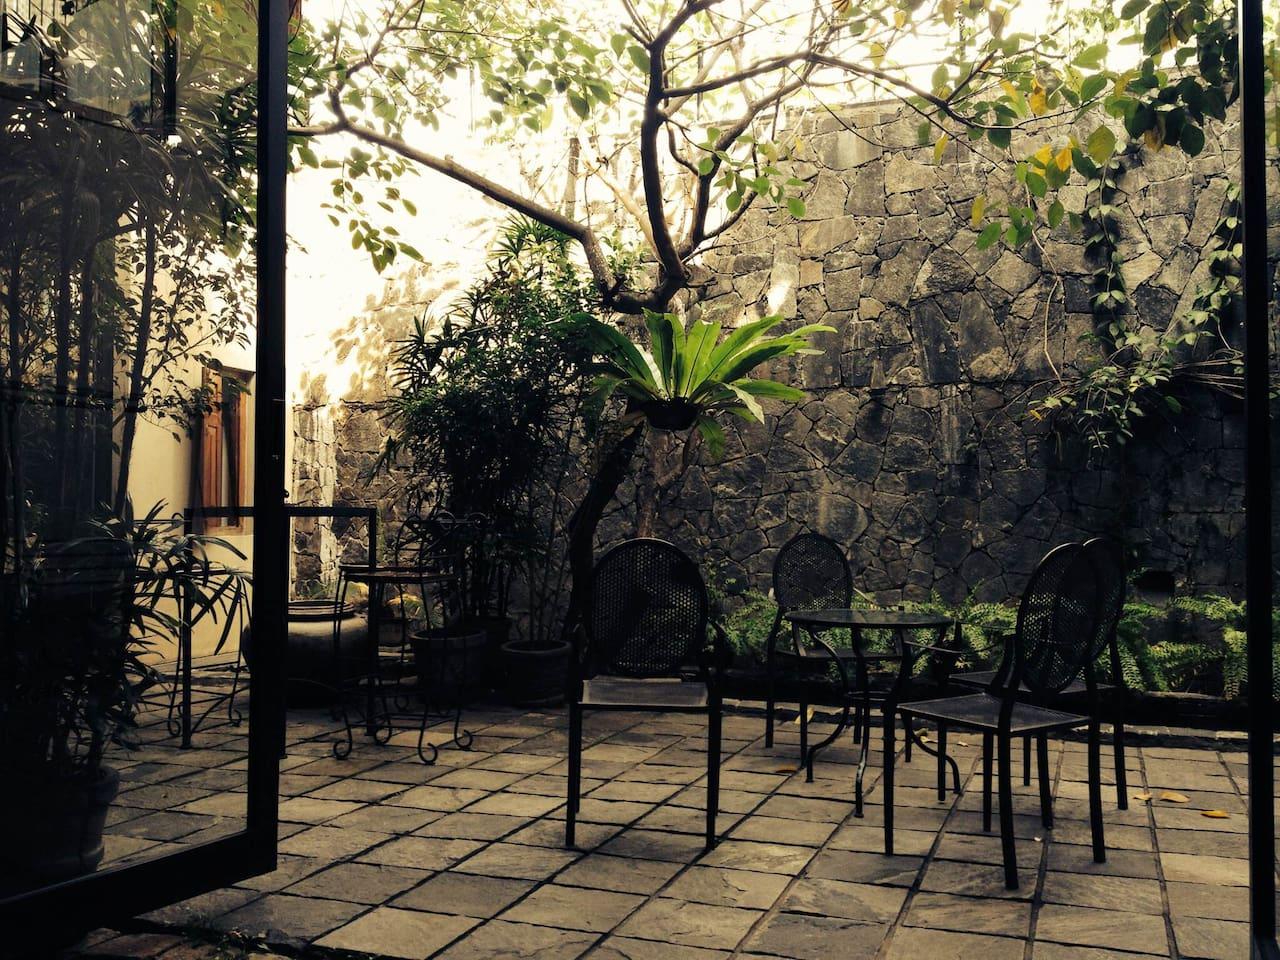 Part of the Unique Courtyard!